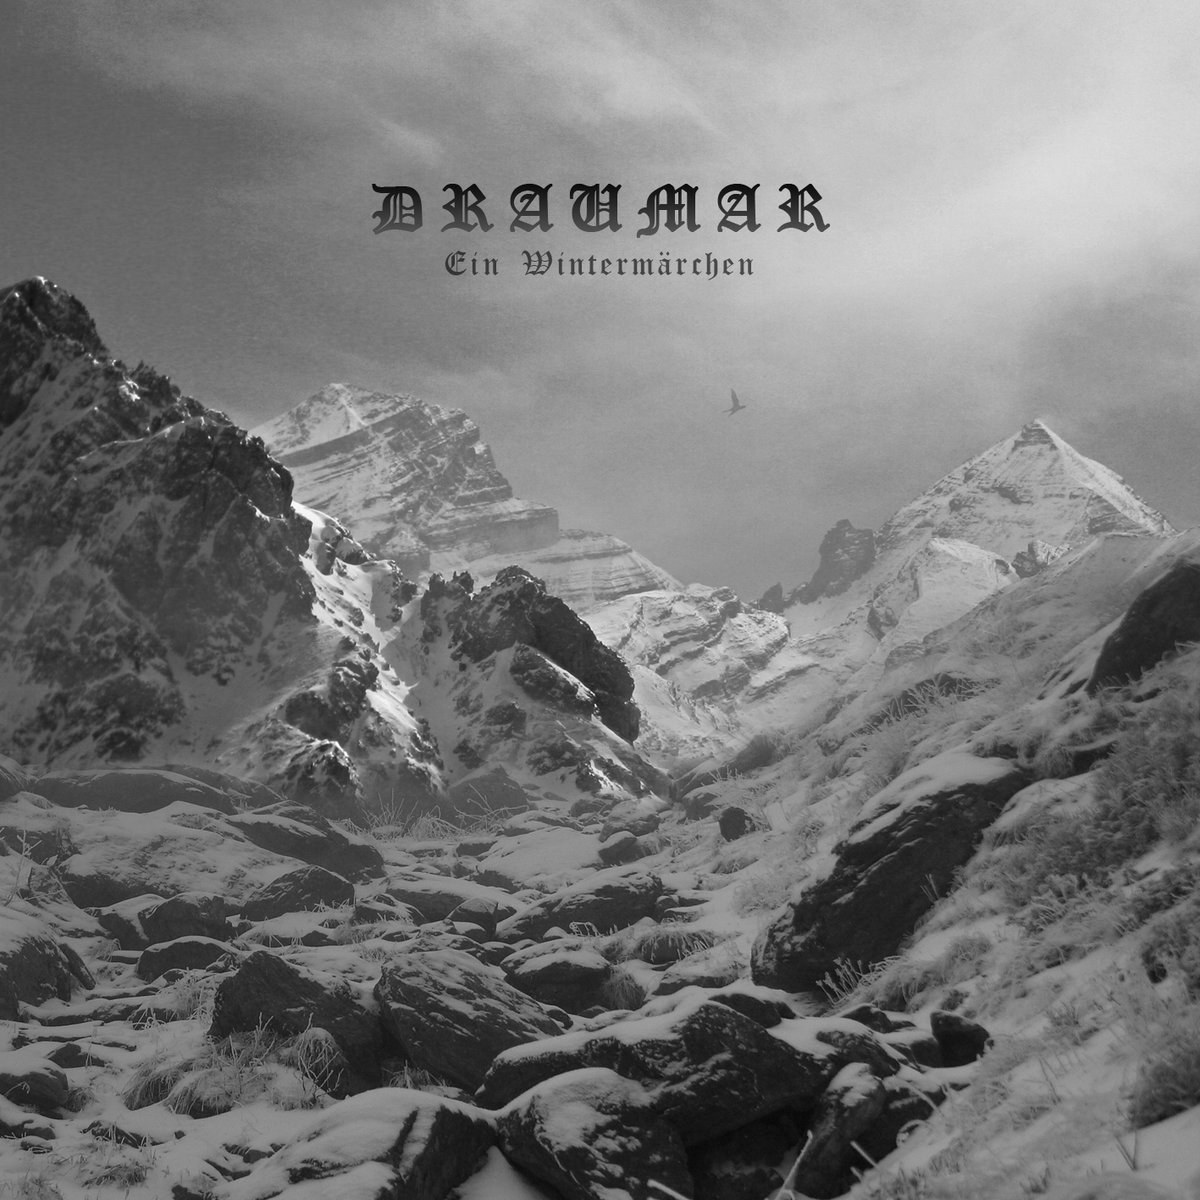 Reviews for Draumar - Ein Wintermärchen